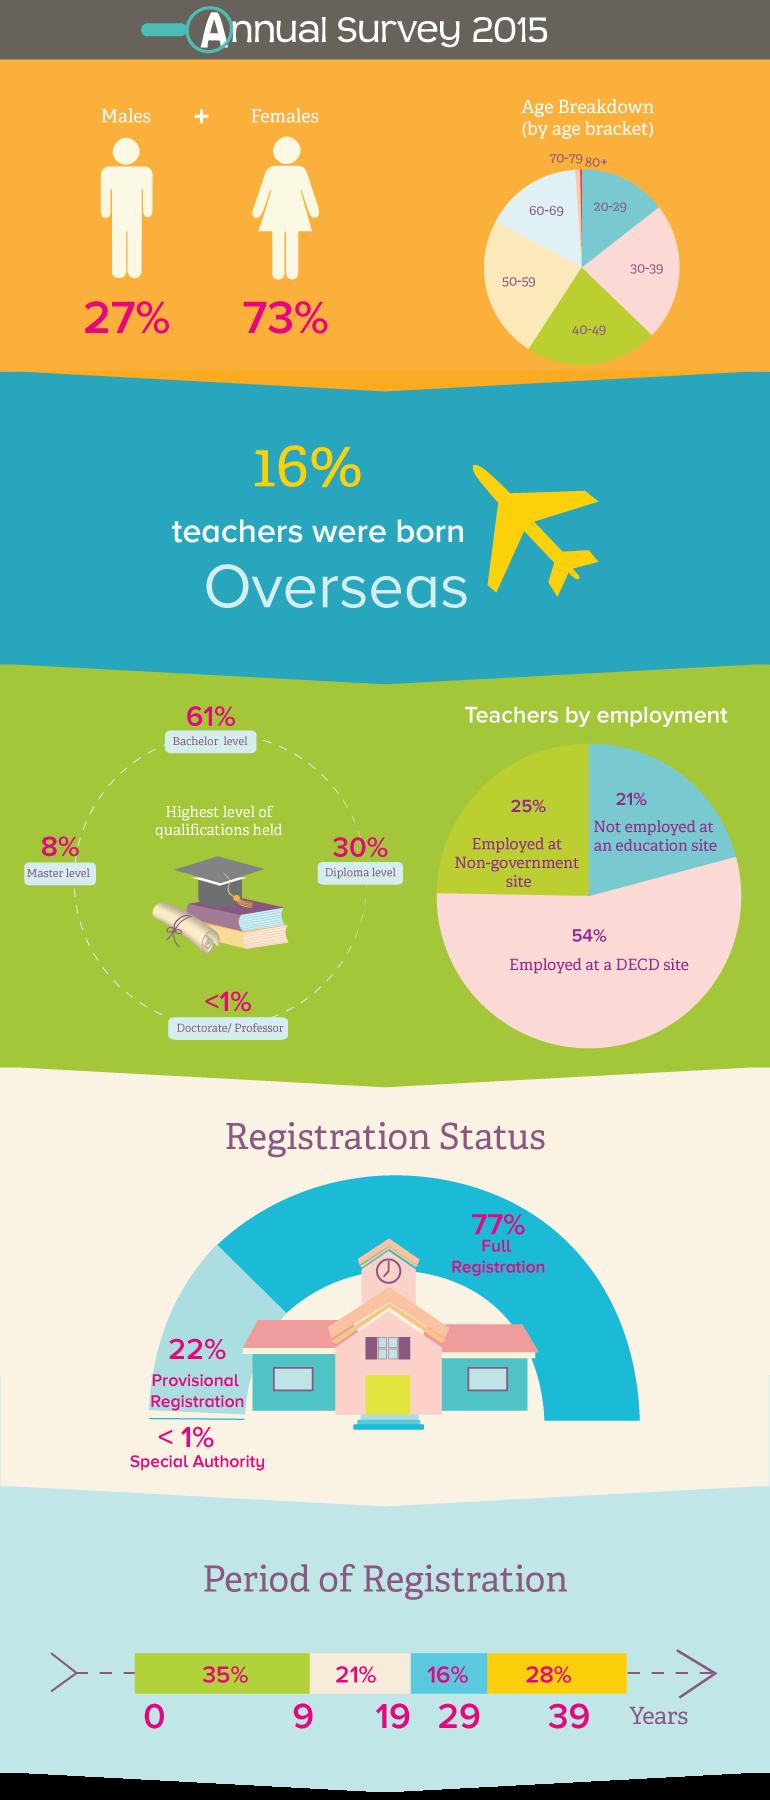 Annual Survey 2015 Infographic Teacher registration